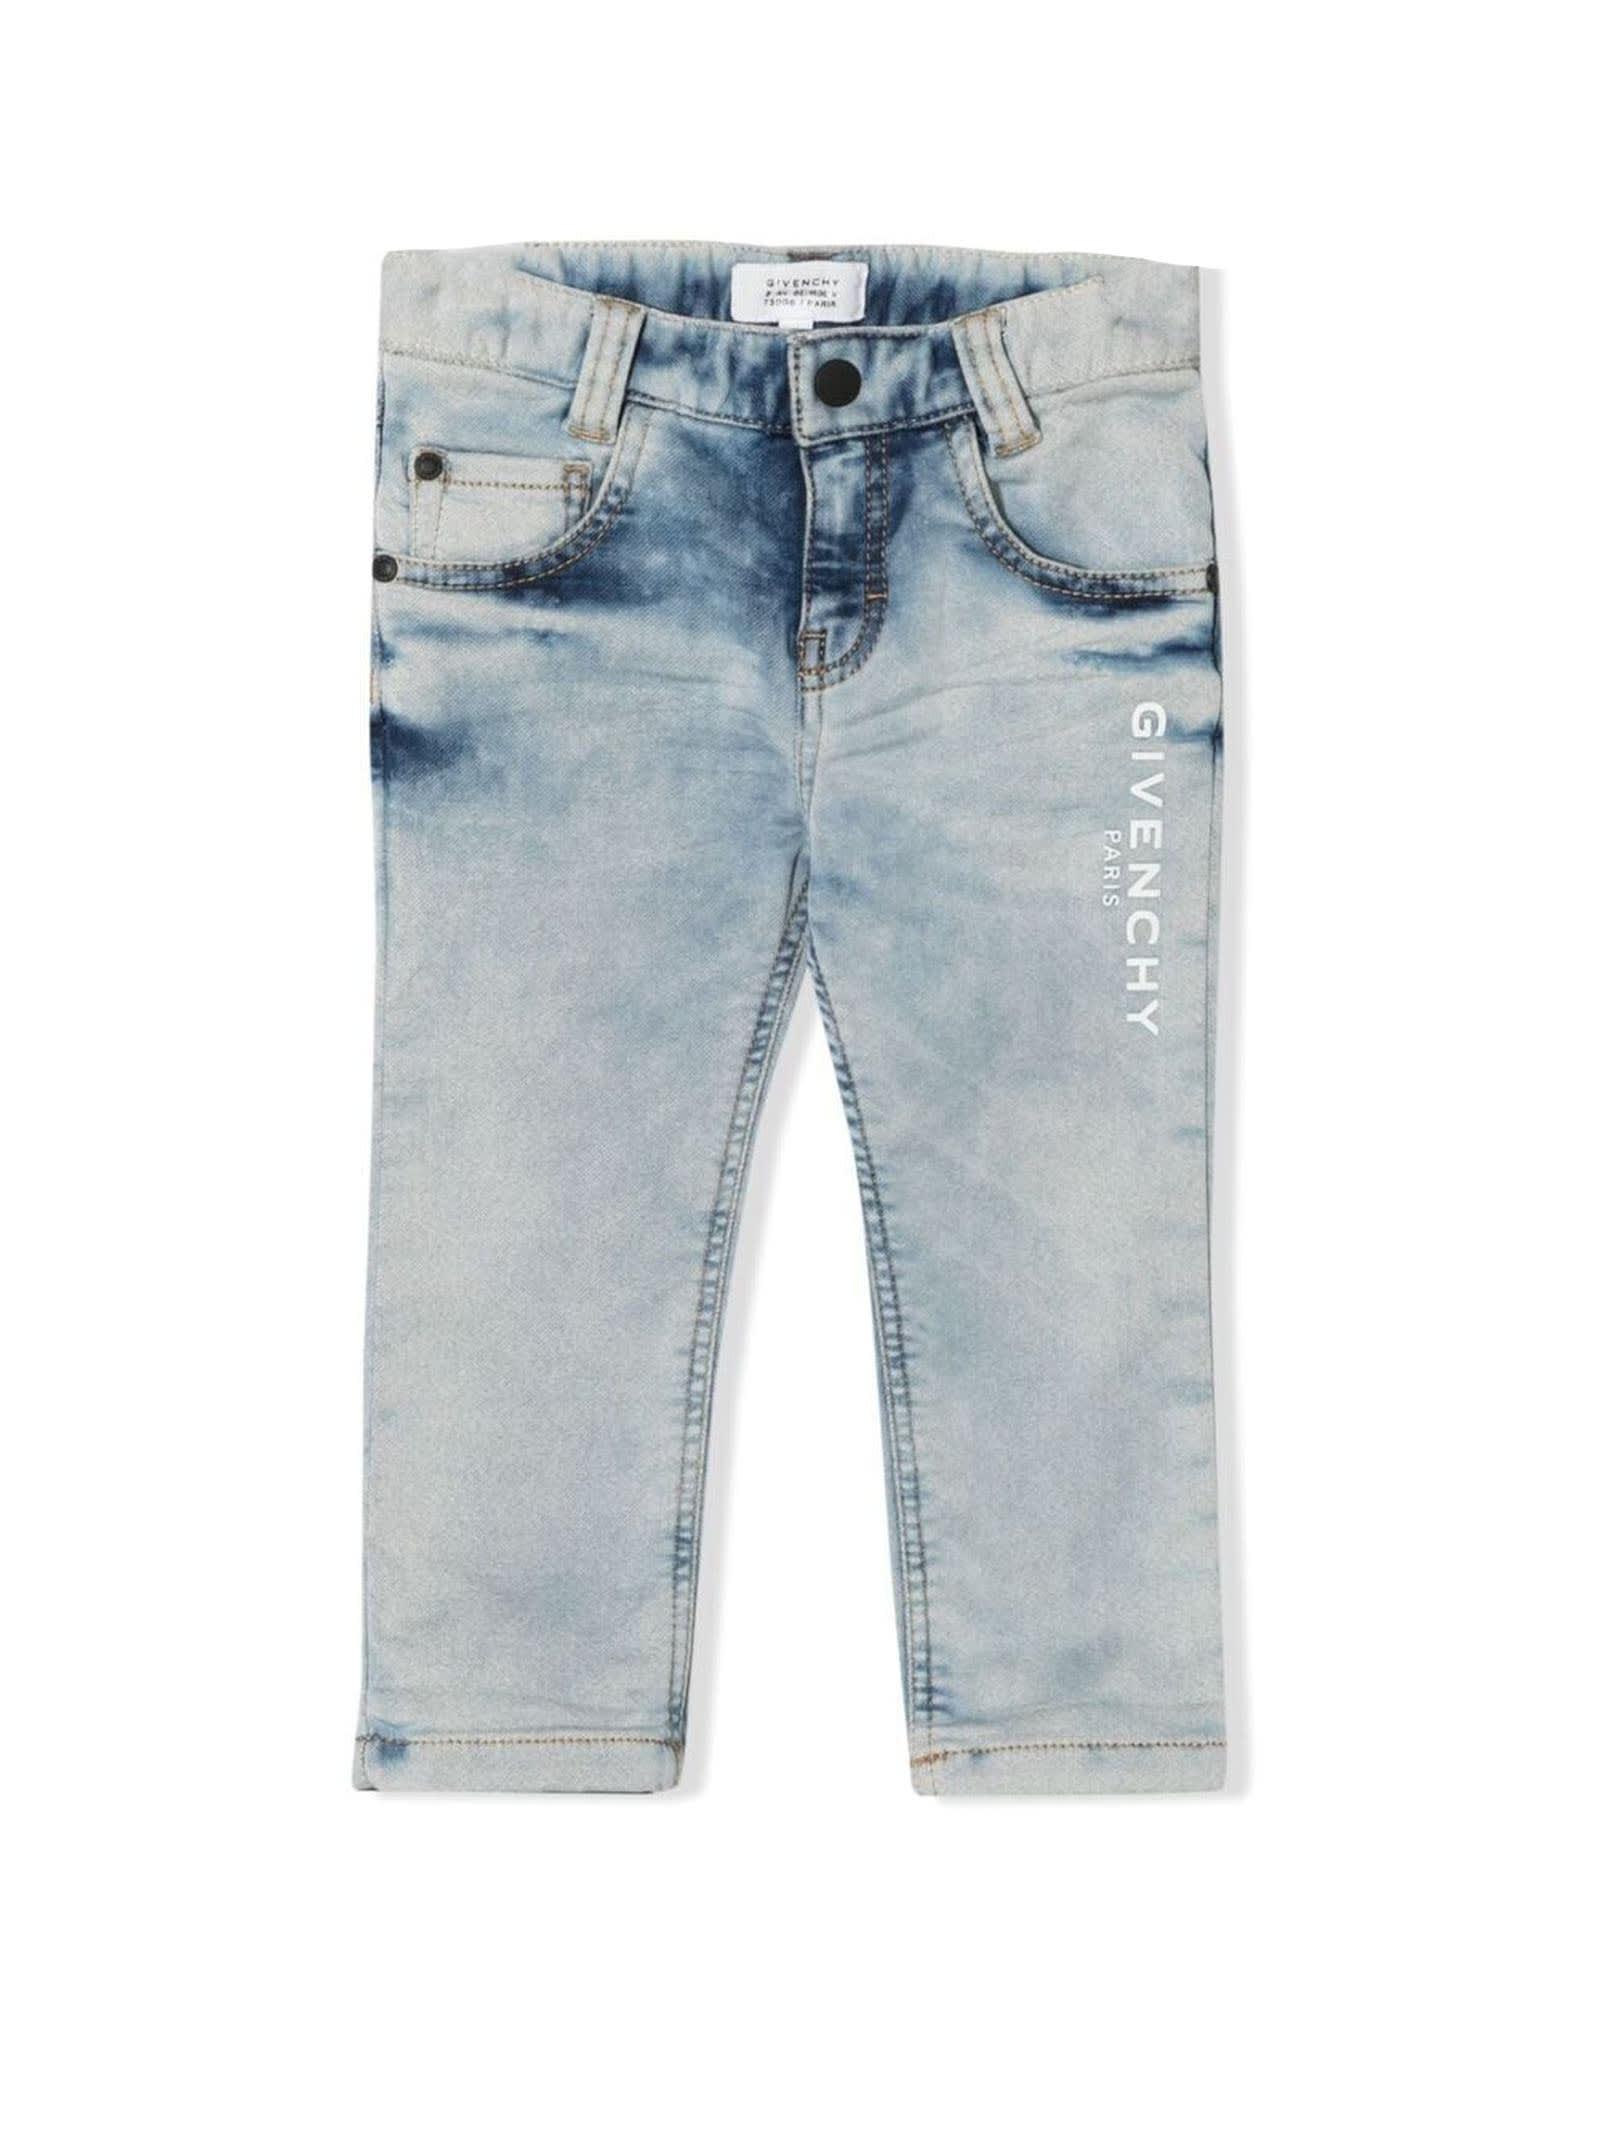 Givenchy Grey Stretch Cotton Blend Jeans